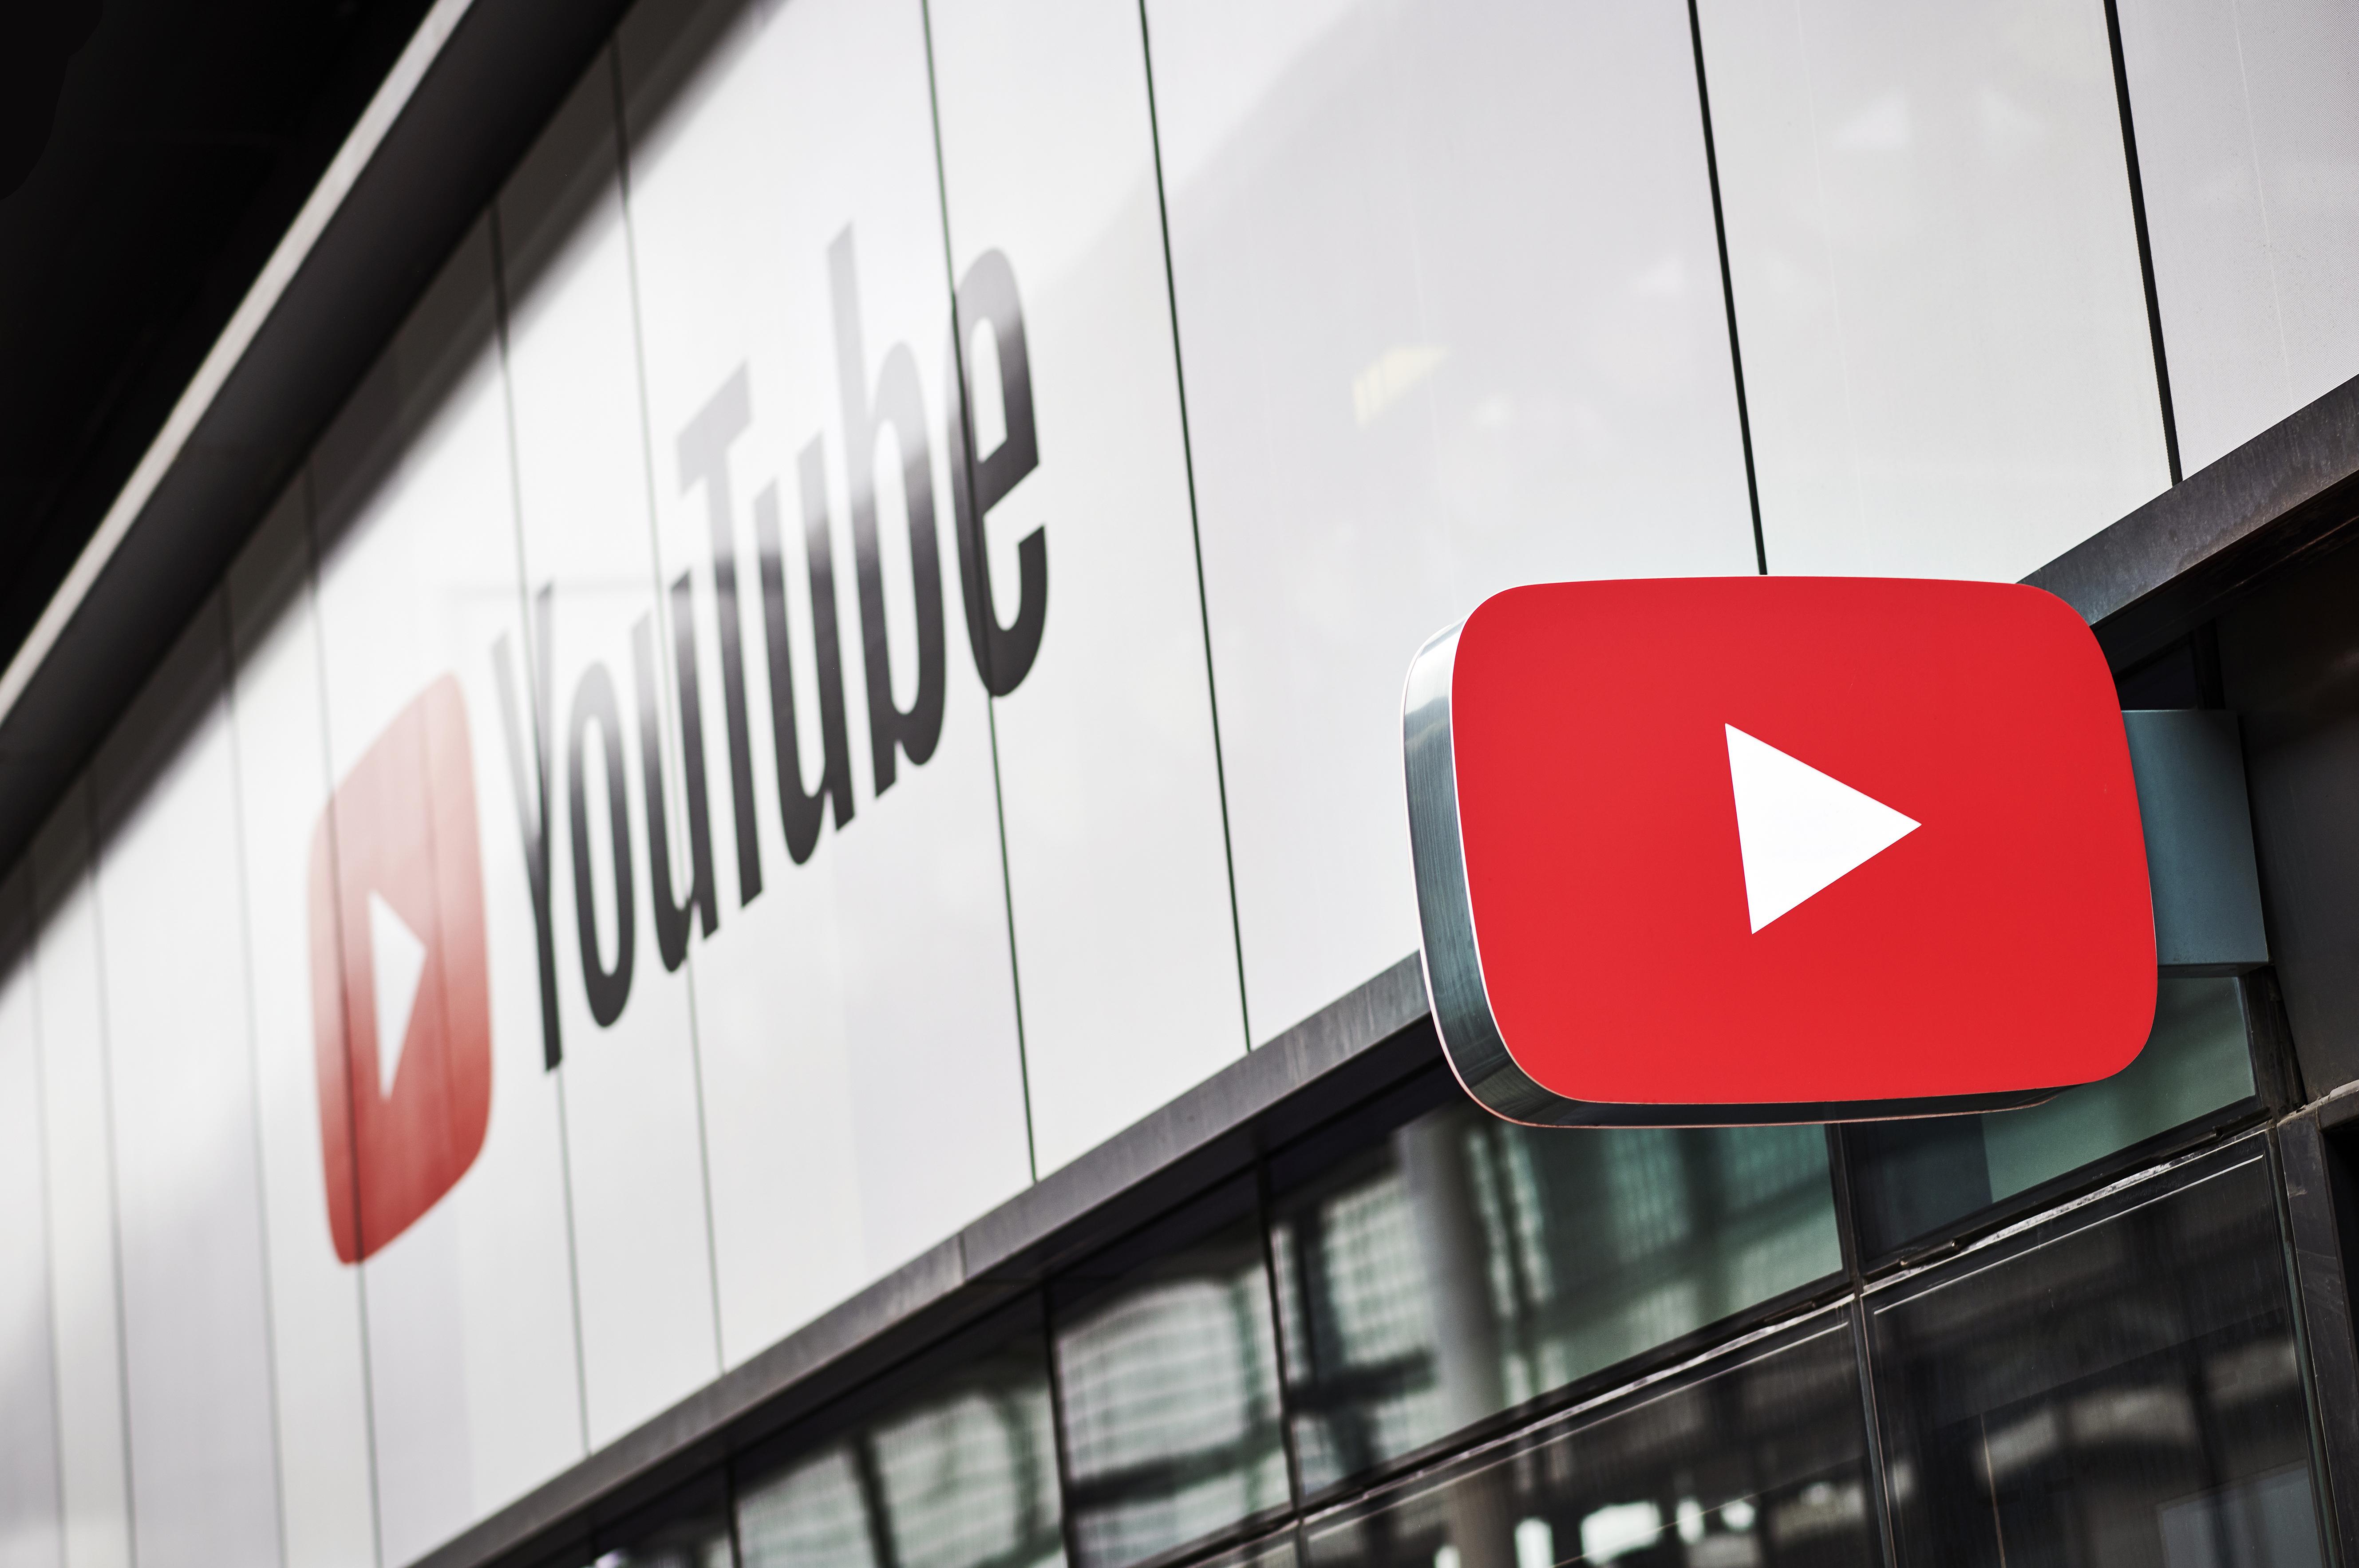 YouTube suspends Sky News Australia uploads over COVID-19 misinformation